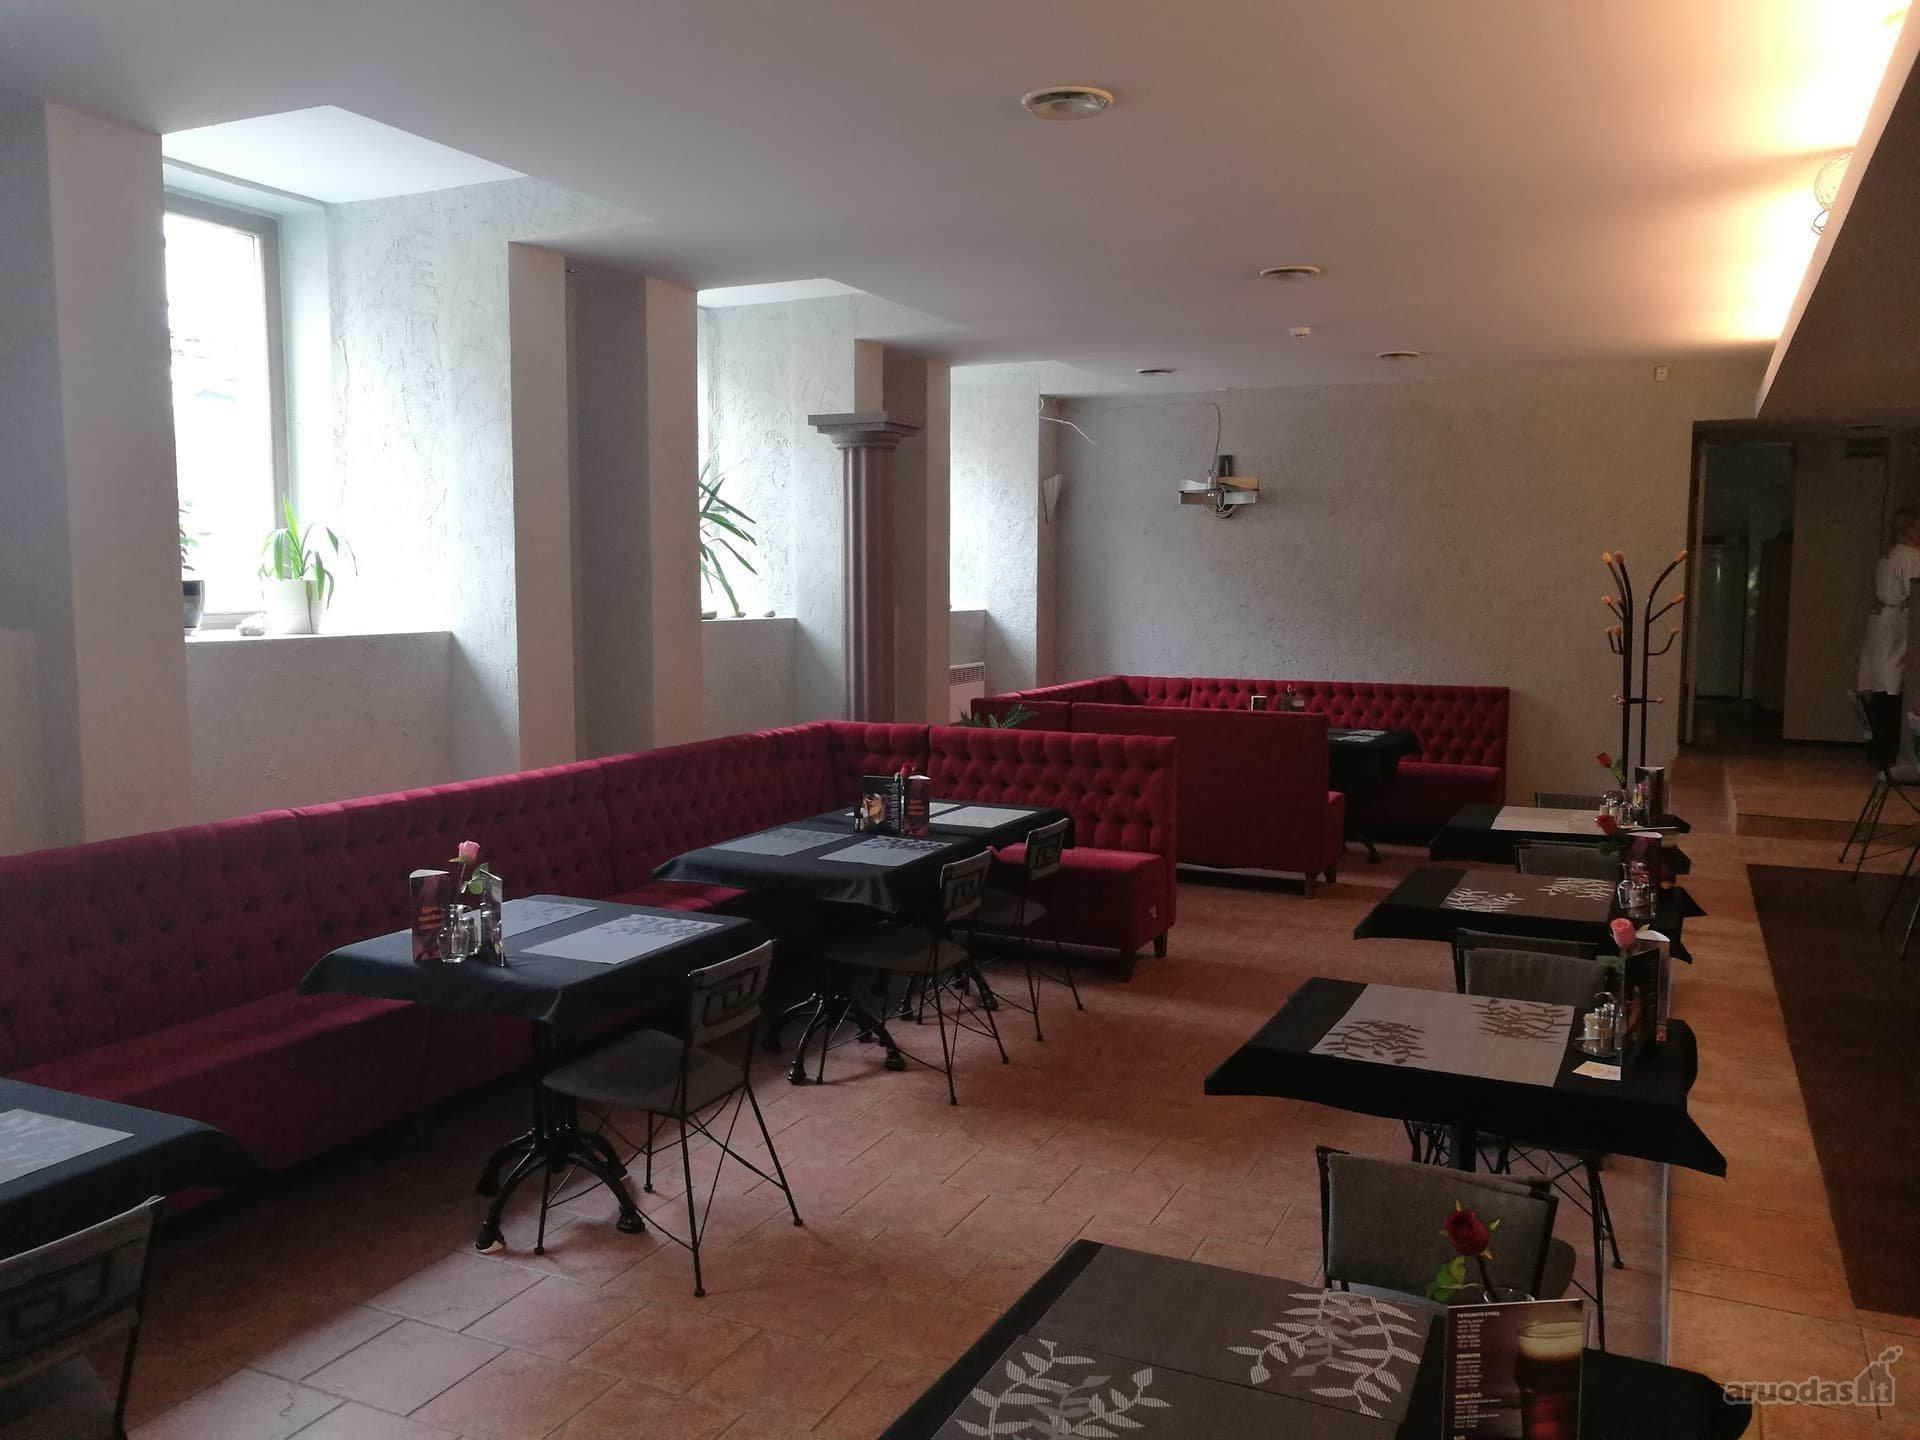 Rent property abroad Restaurant property in Vilnius (LT)